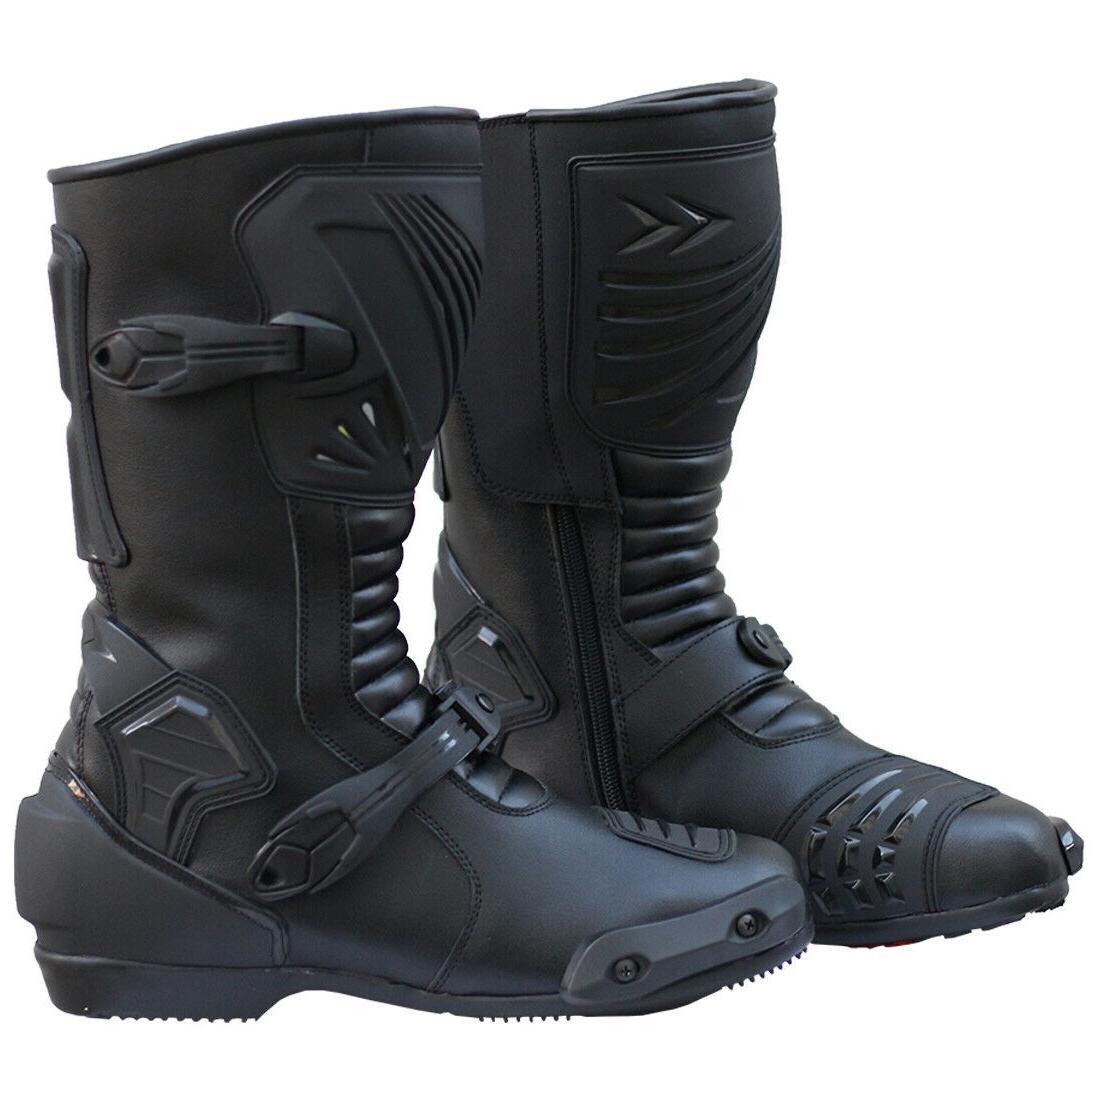 Anti-Skid Racing Boots